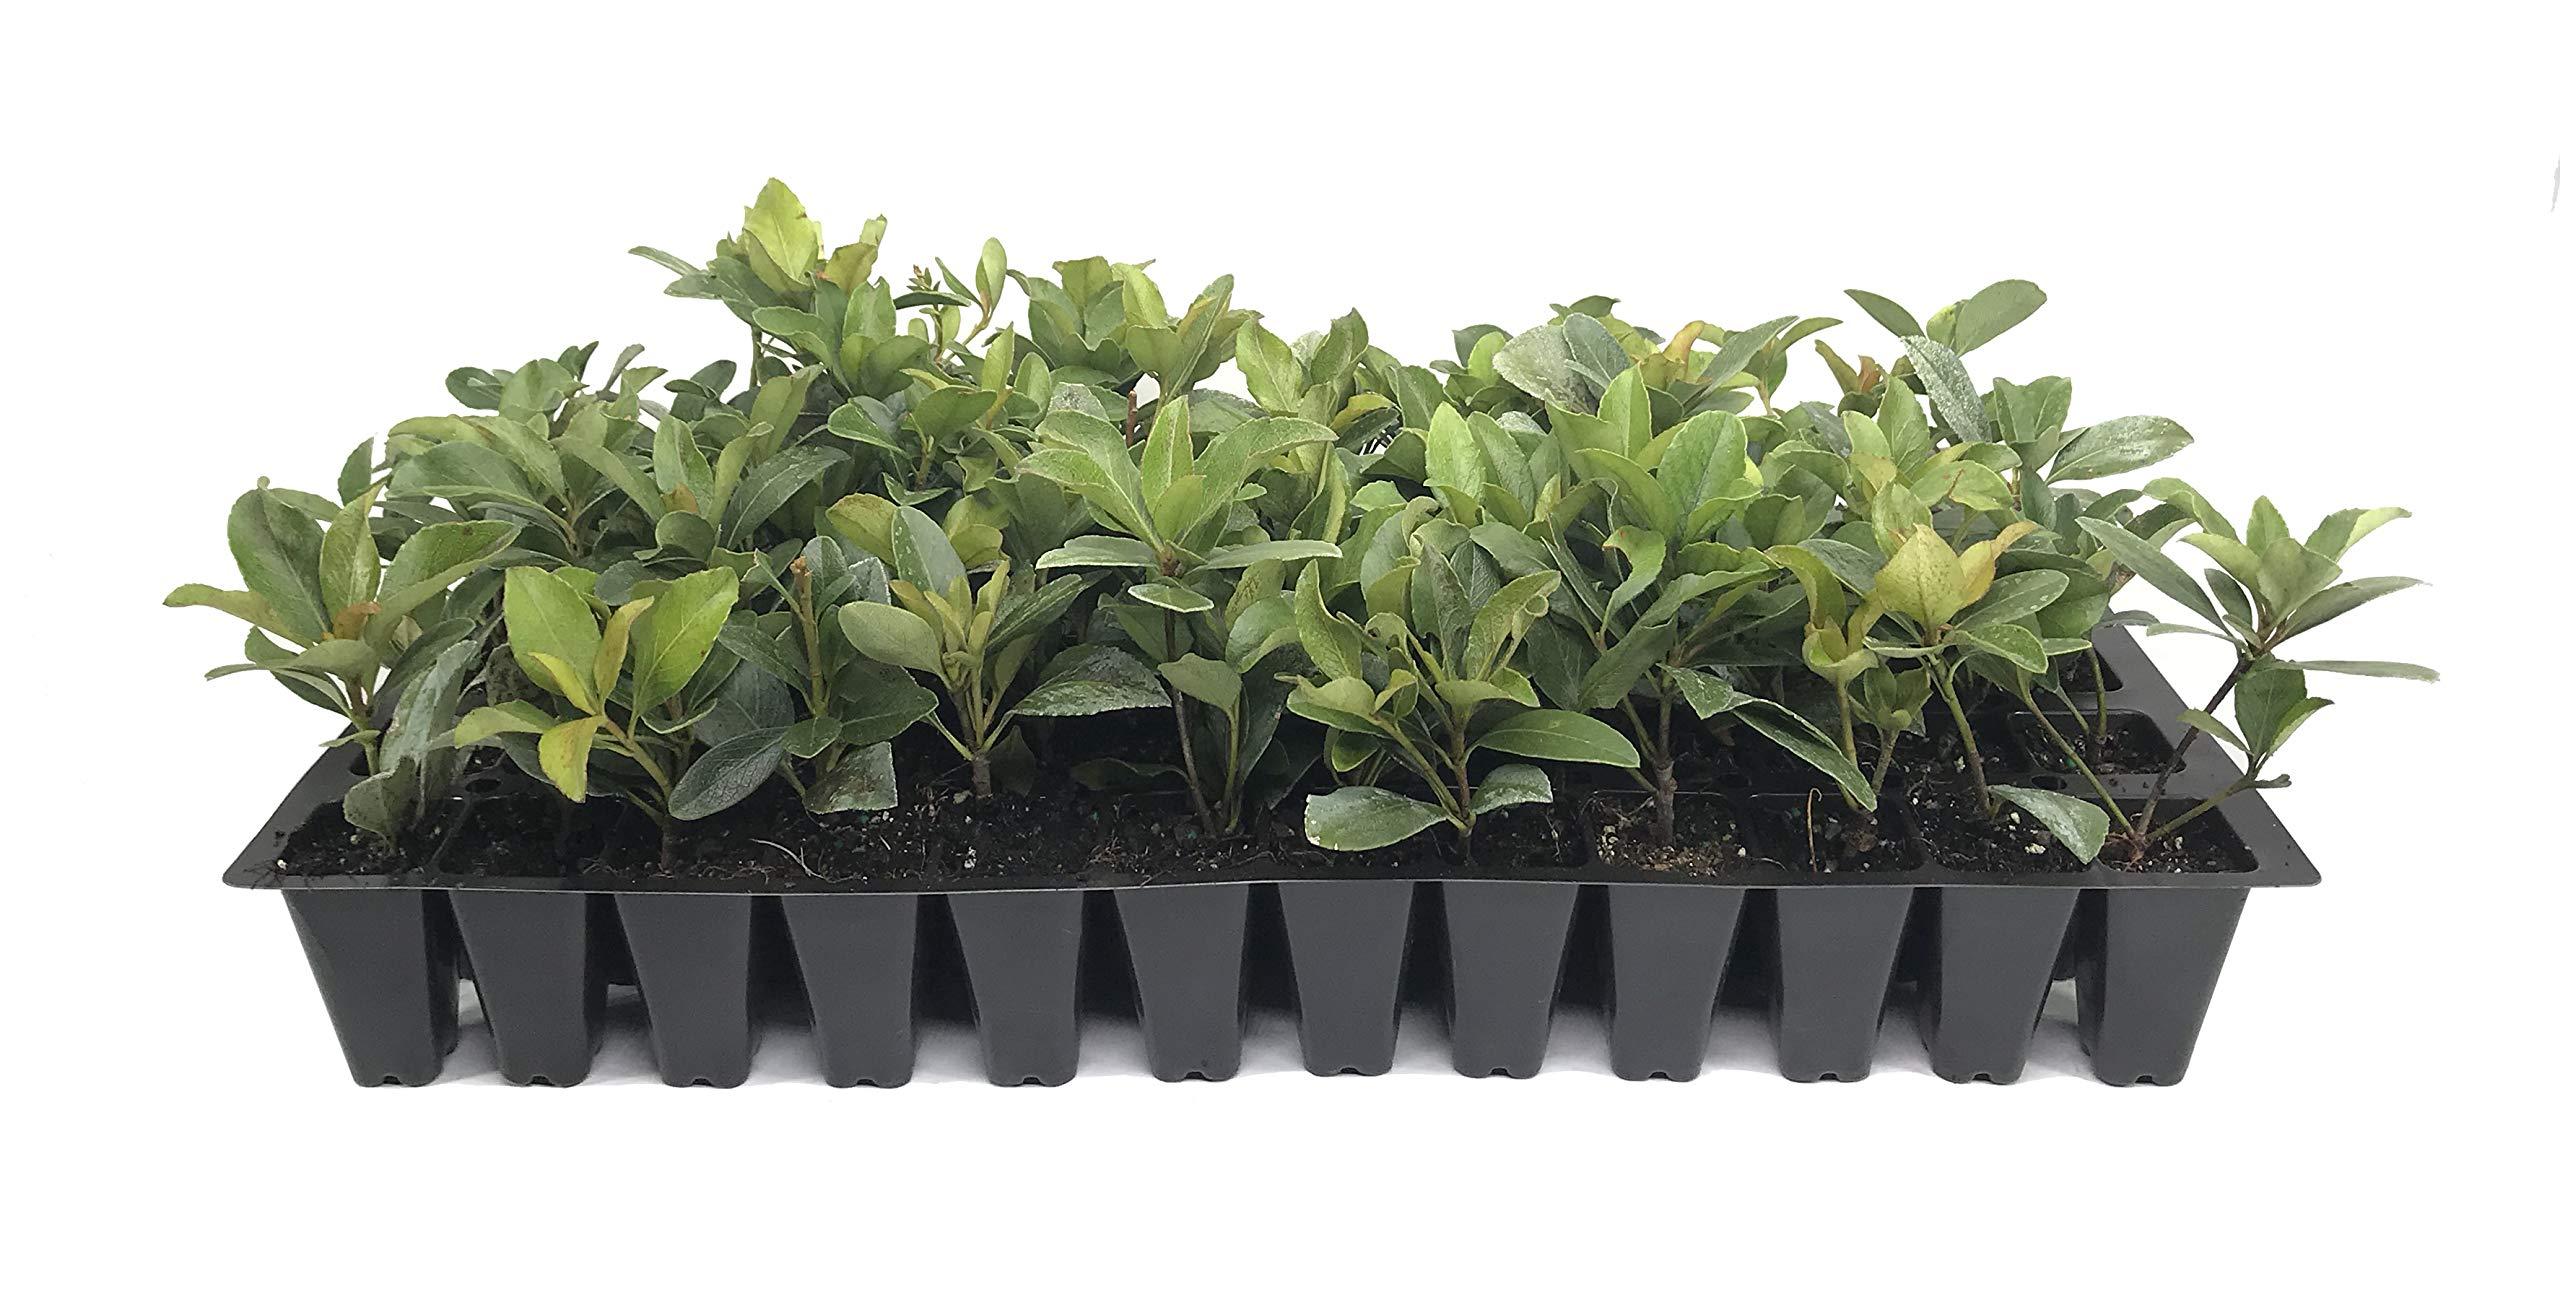 Indian Hawthorn Alba Qty 20 Live Plants Evergreen Shrub by Florida Foliage